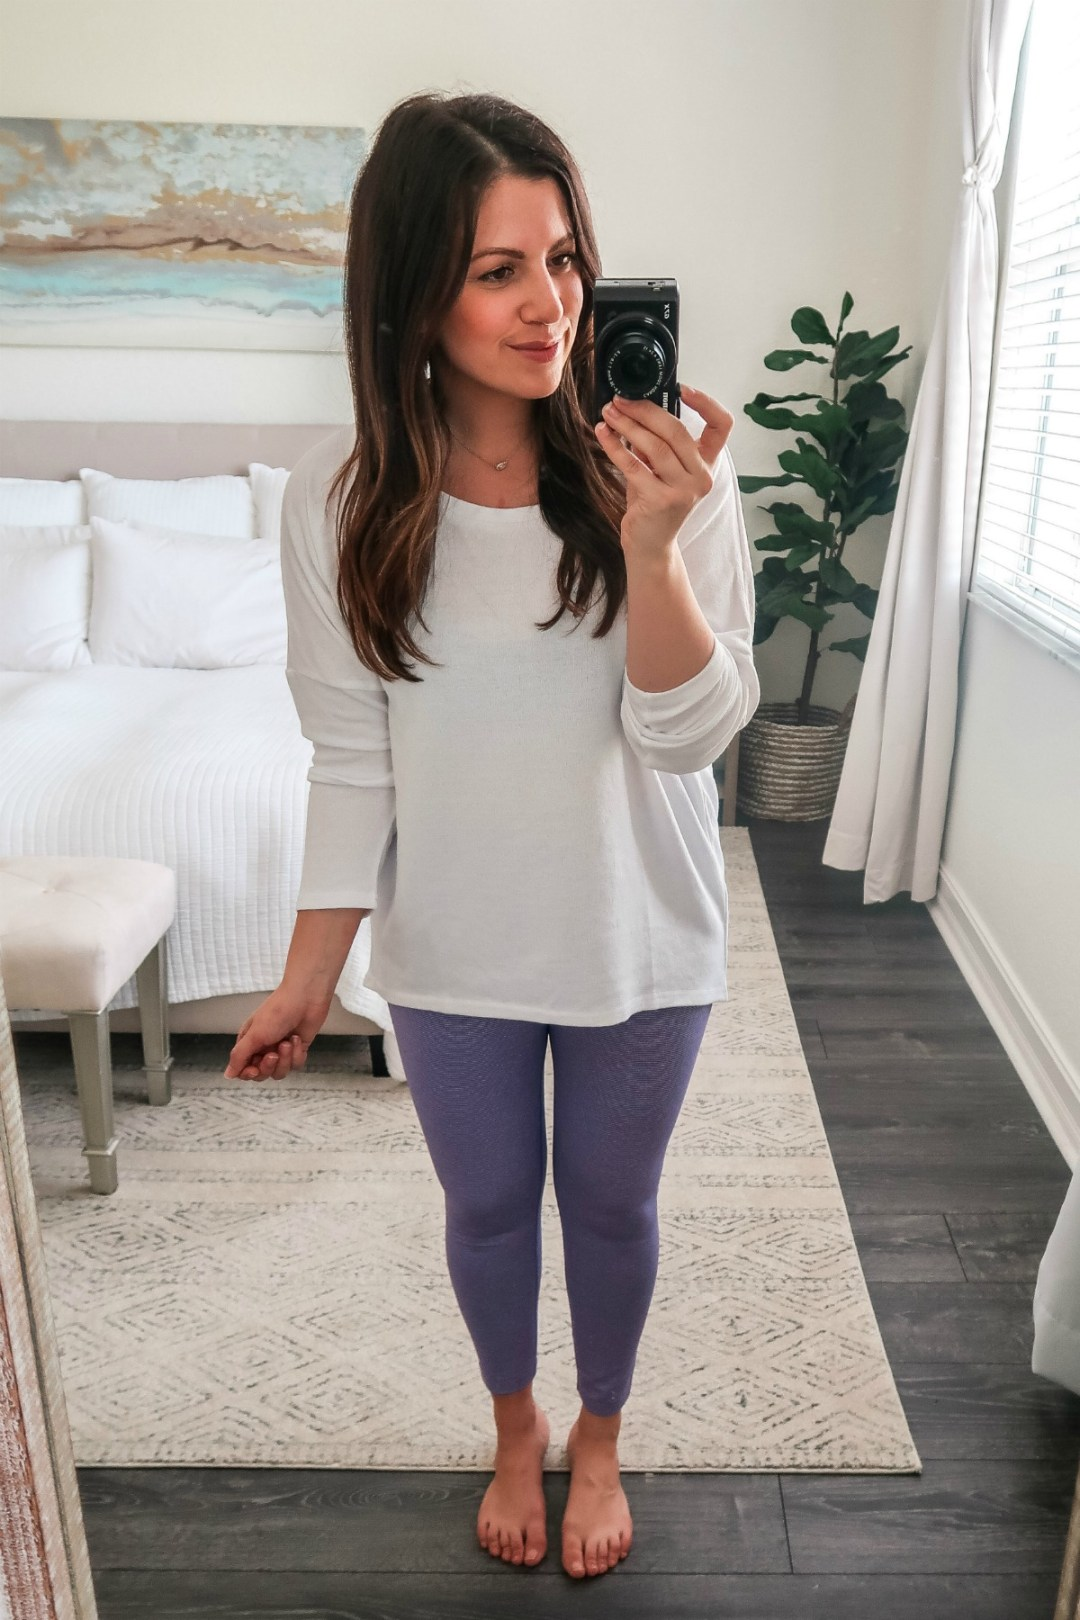 Amazon Fashion Core 10 Leggings, purple Core 10 leggings